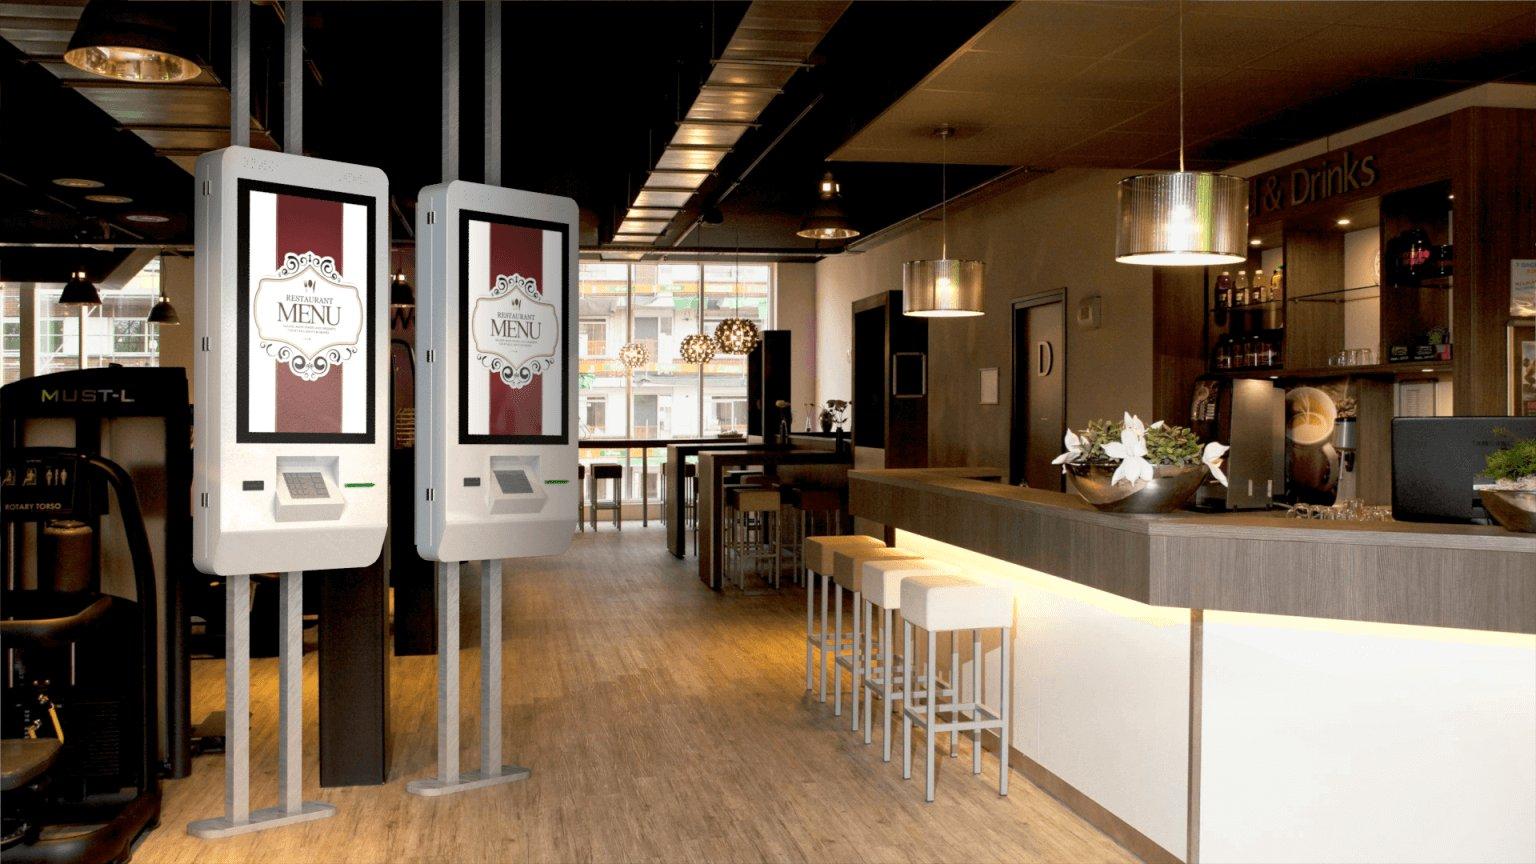 Терминалы самообслуживания в ресторанах фаст-фуд